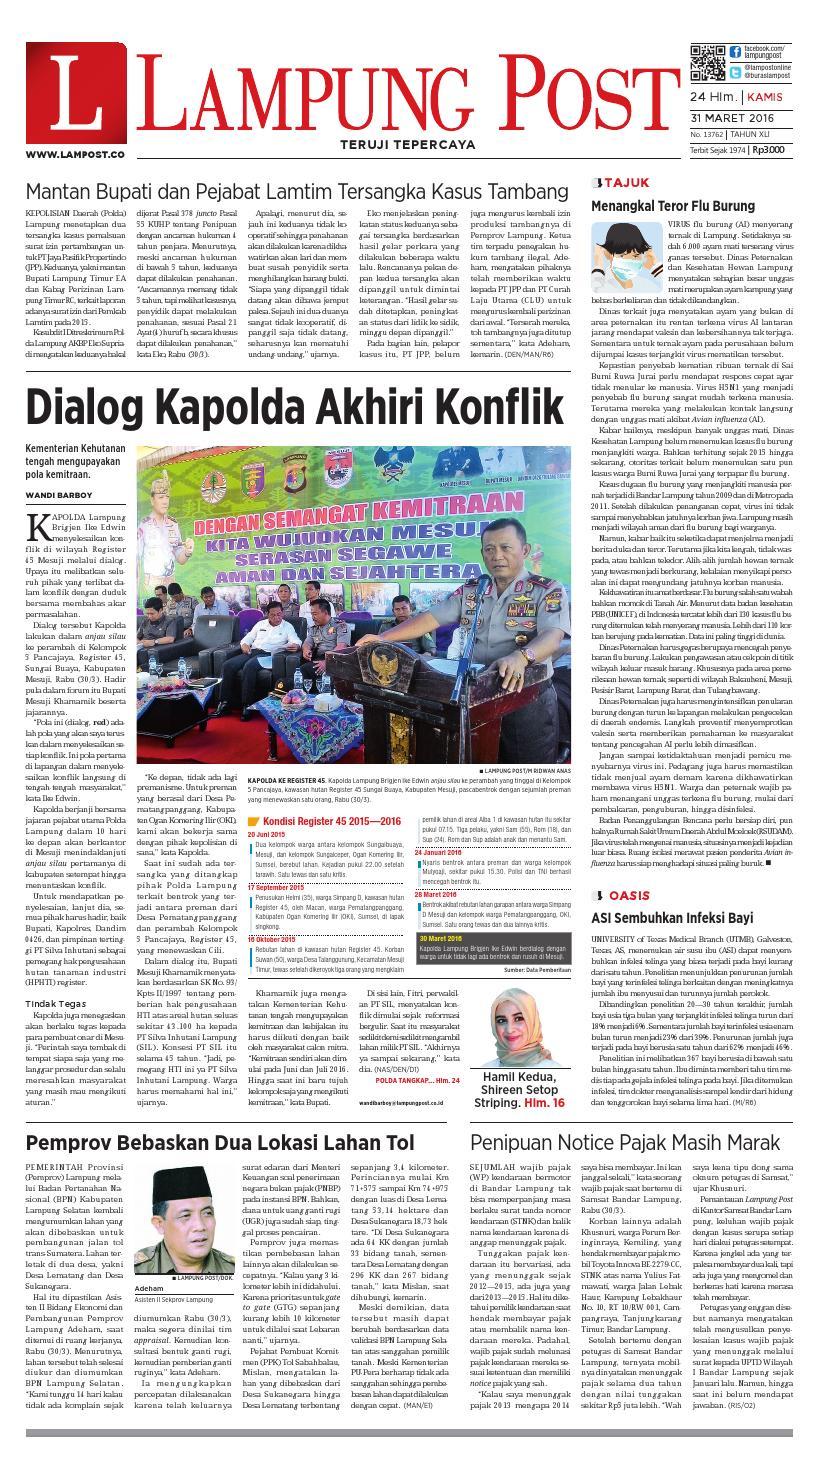 Lampung Post Kamis 31 Maret 2016 By Issuu Produk Ukm Bumn Jamu Kunyit Asam Seger Waras